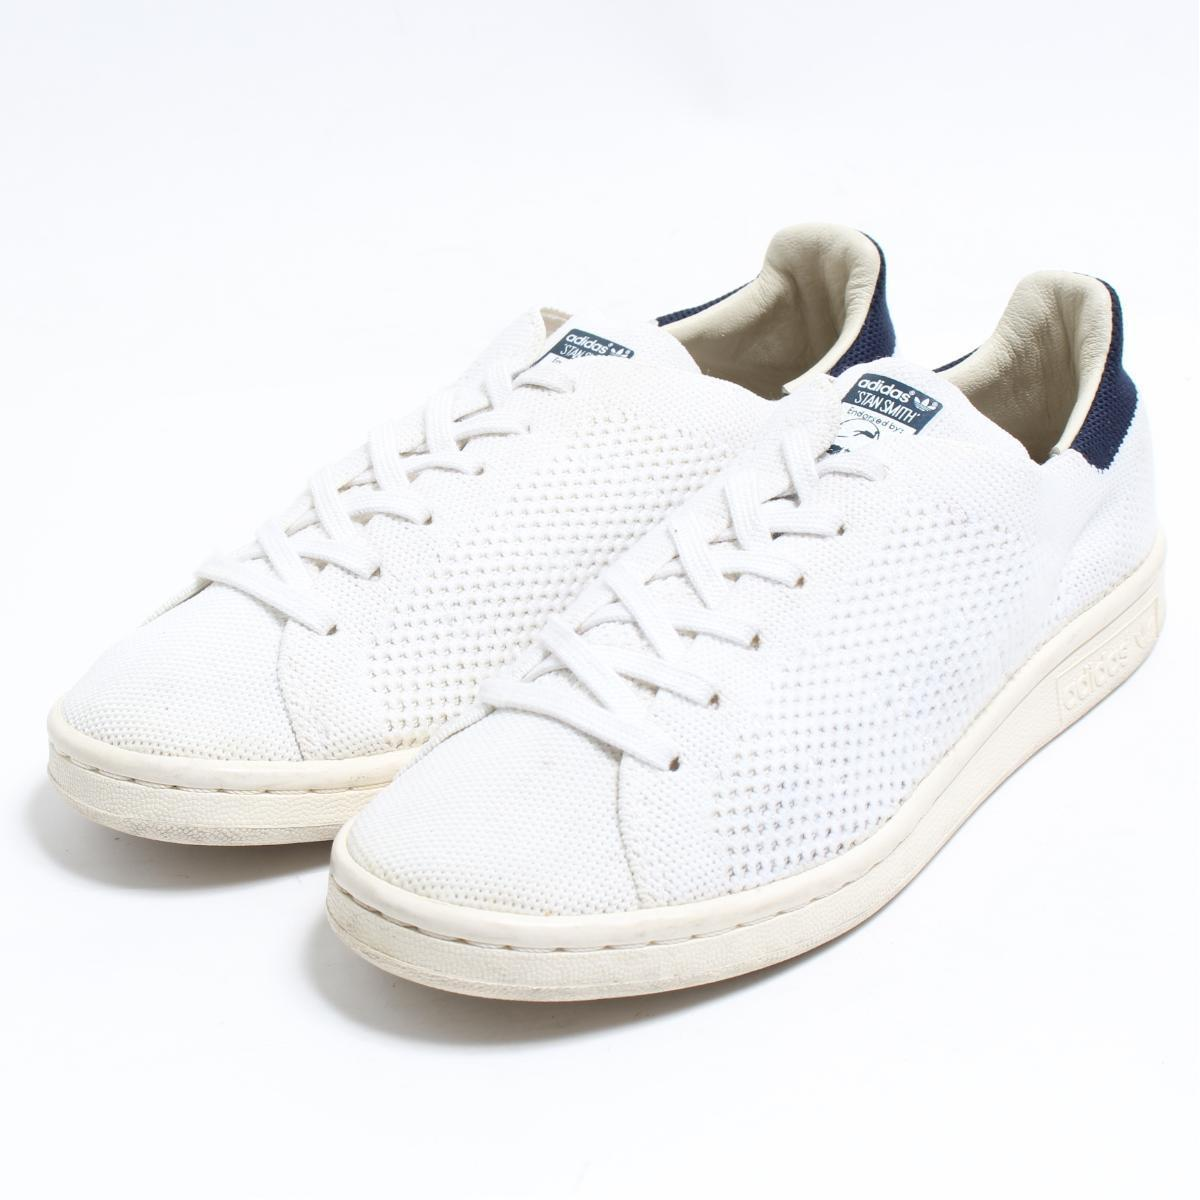 free shipping 26110 30464 Adidas adidas STAN SMITH Stan Smith sneakers US4.5 Lady's 22.5cm /bon4778